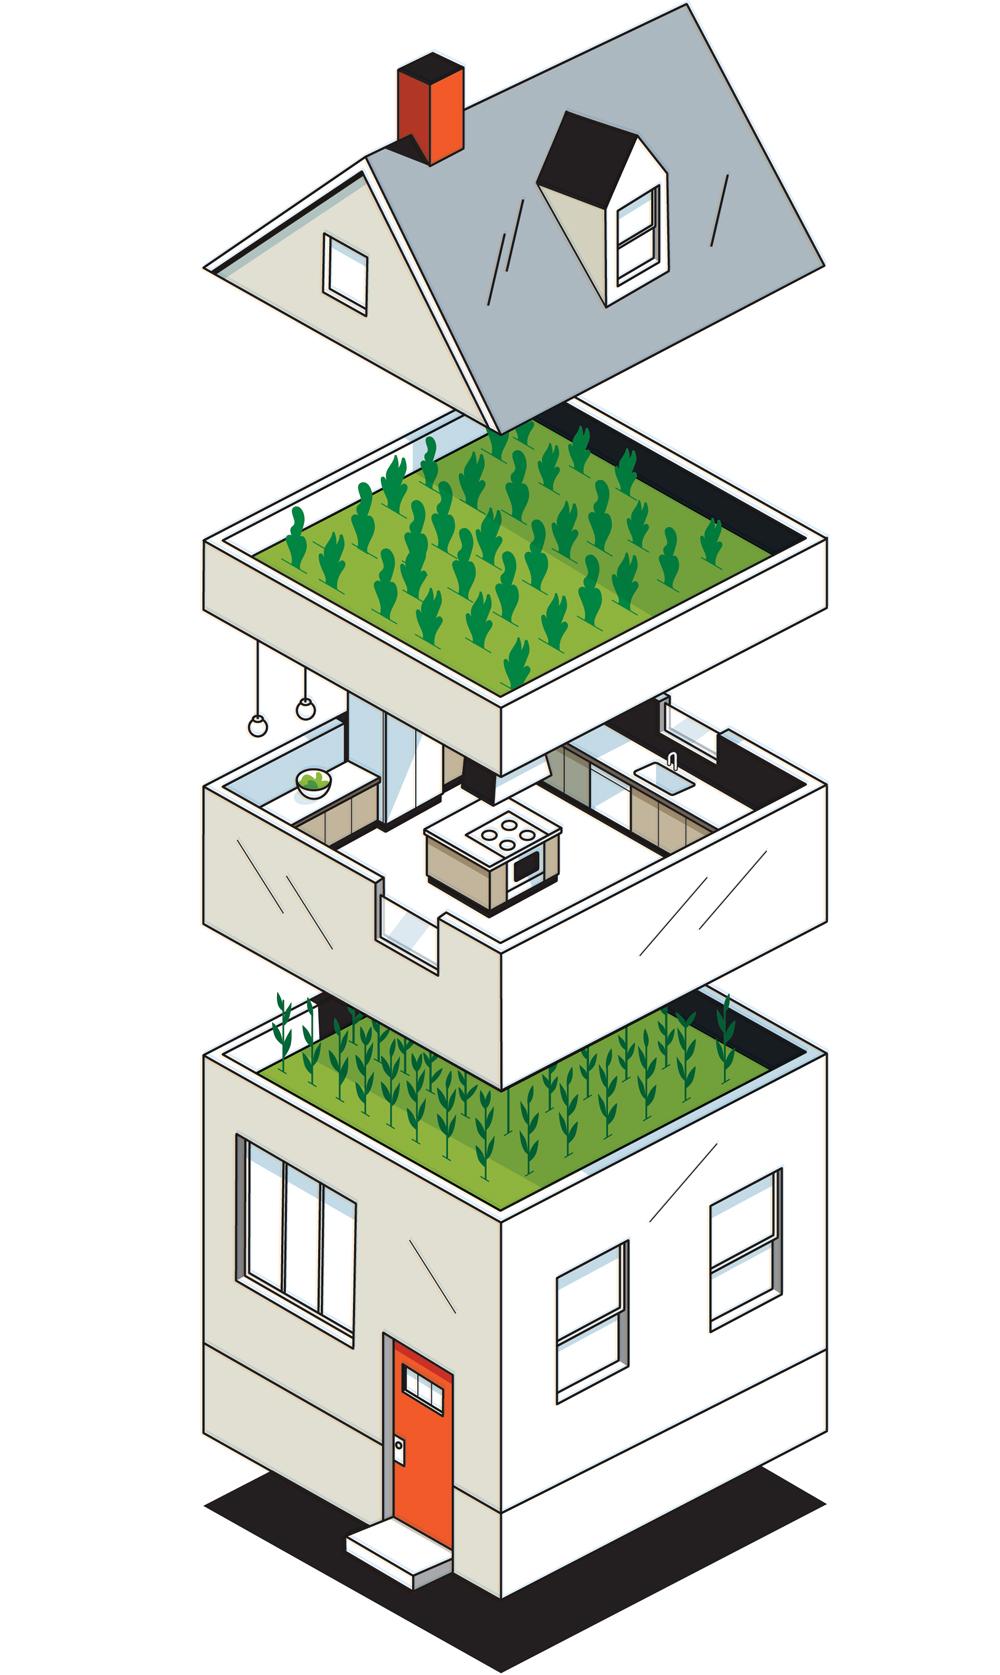 2040 housing